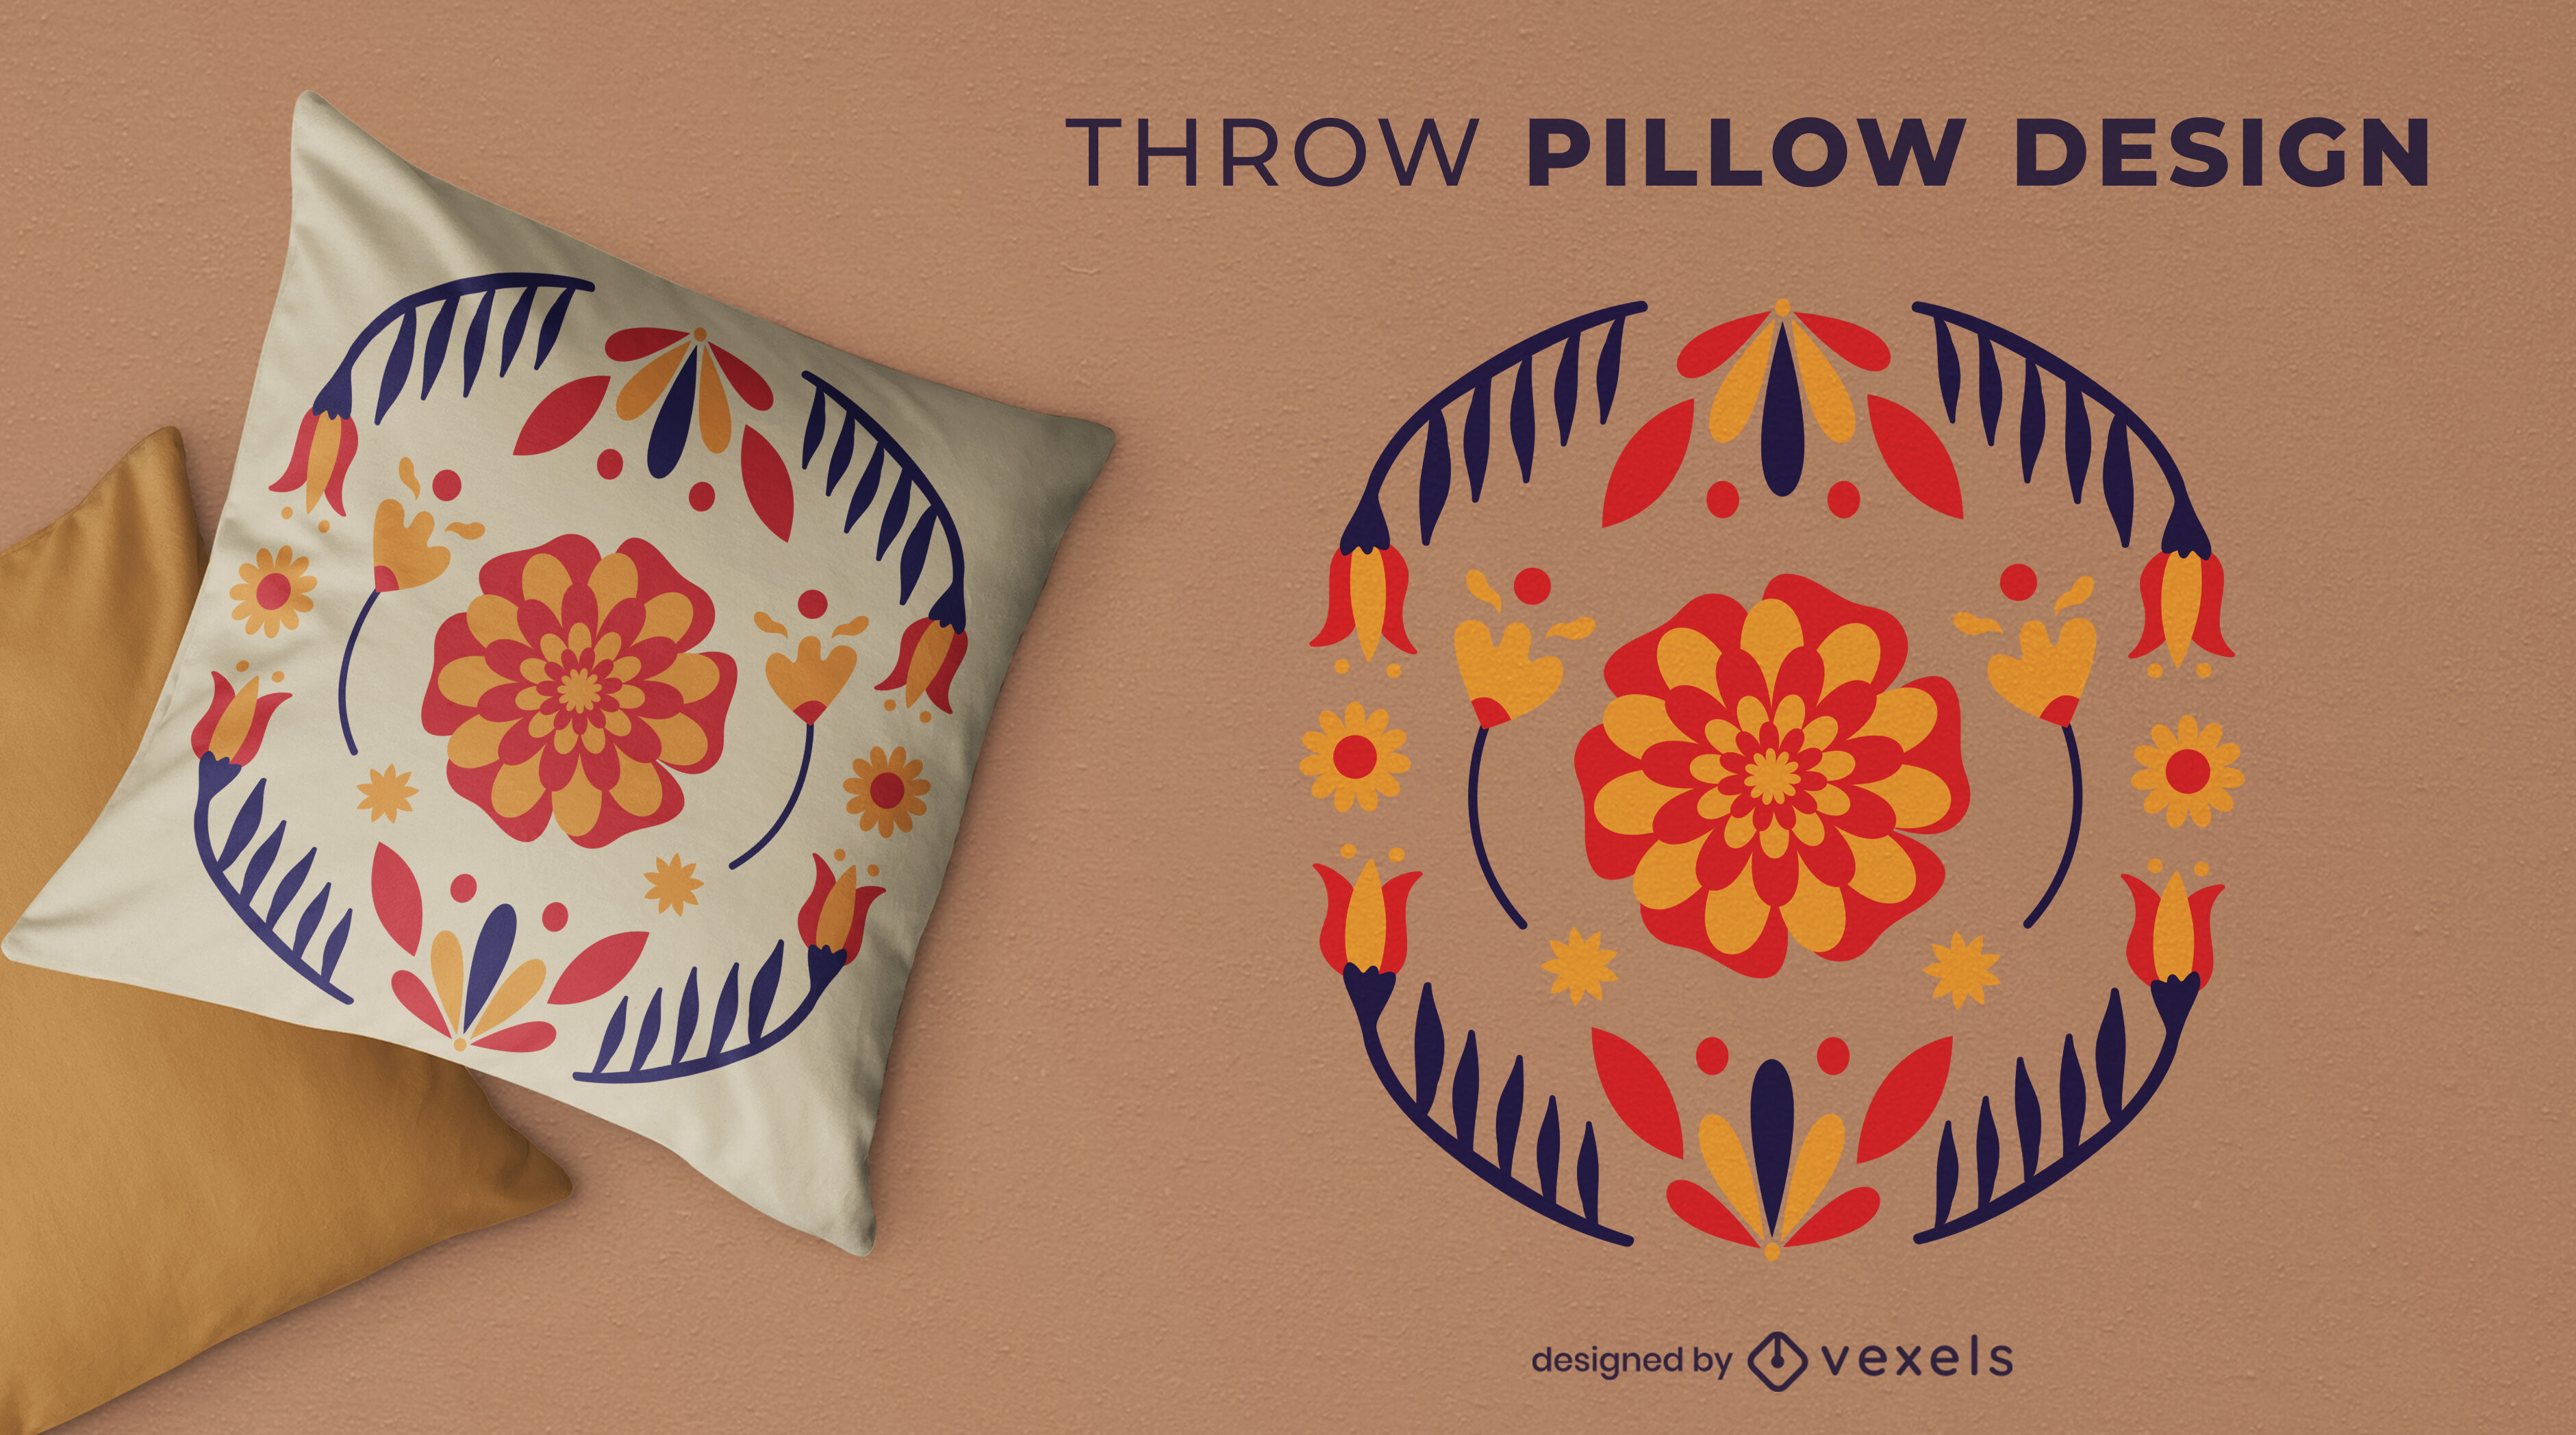 Mirrored flowers throw pillow design